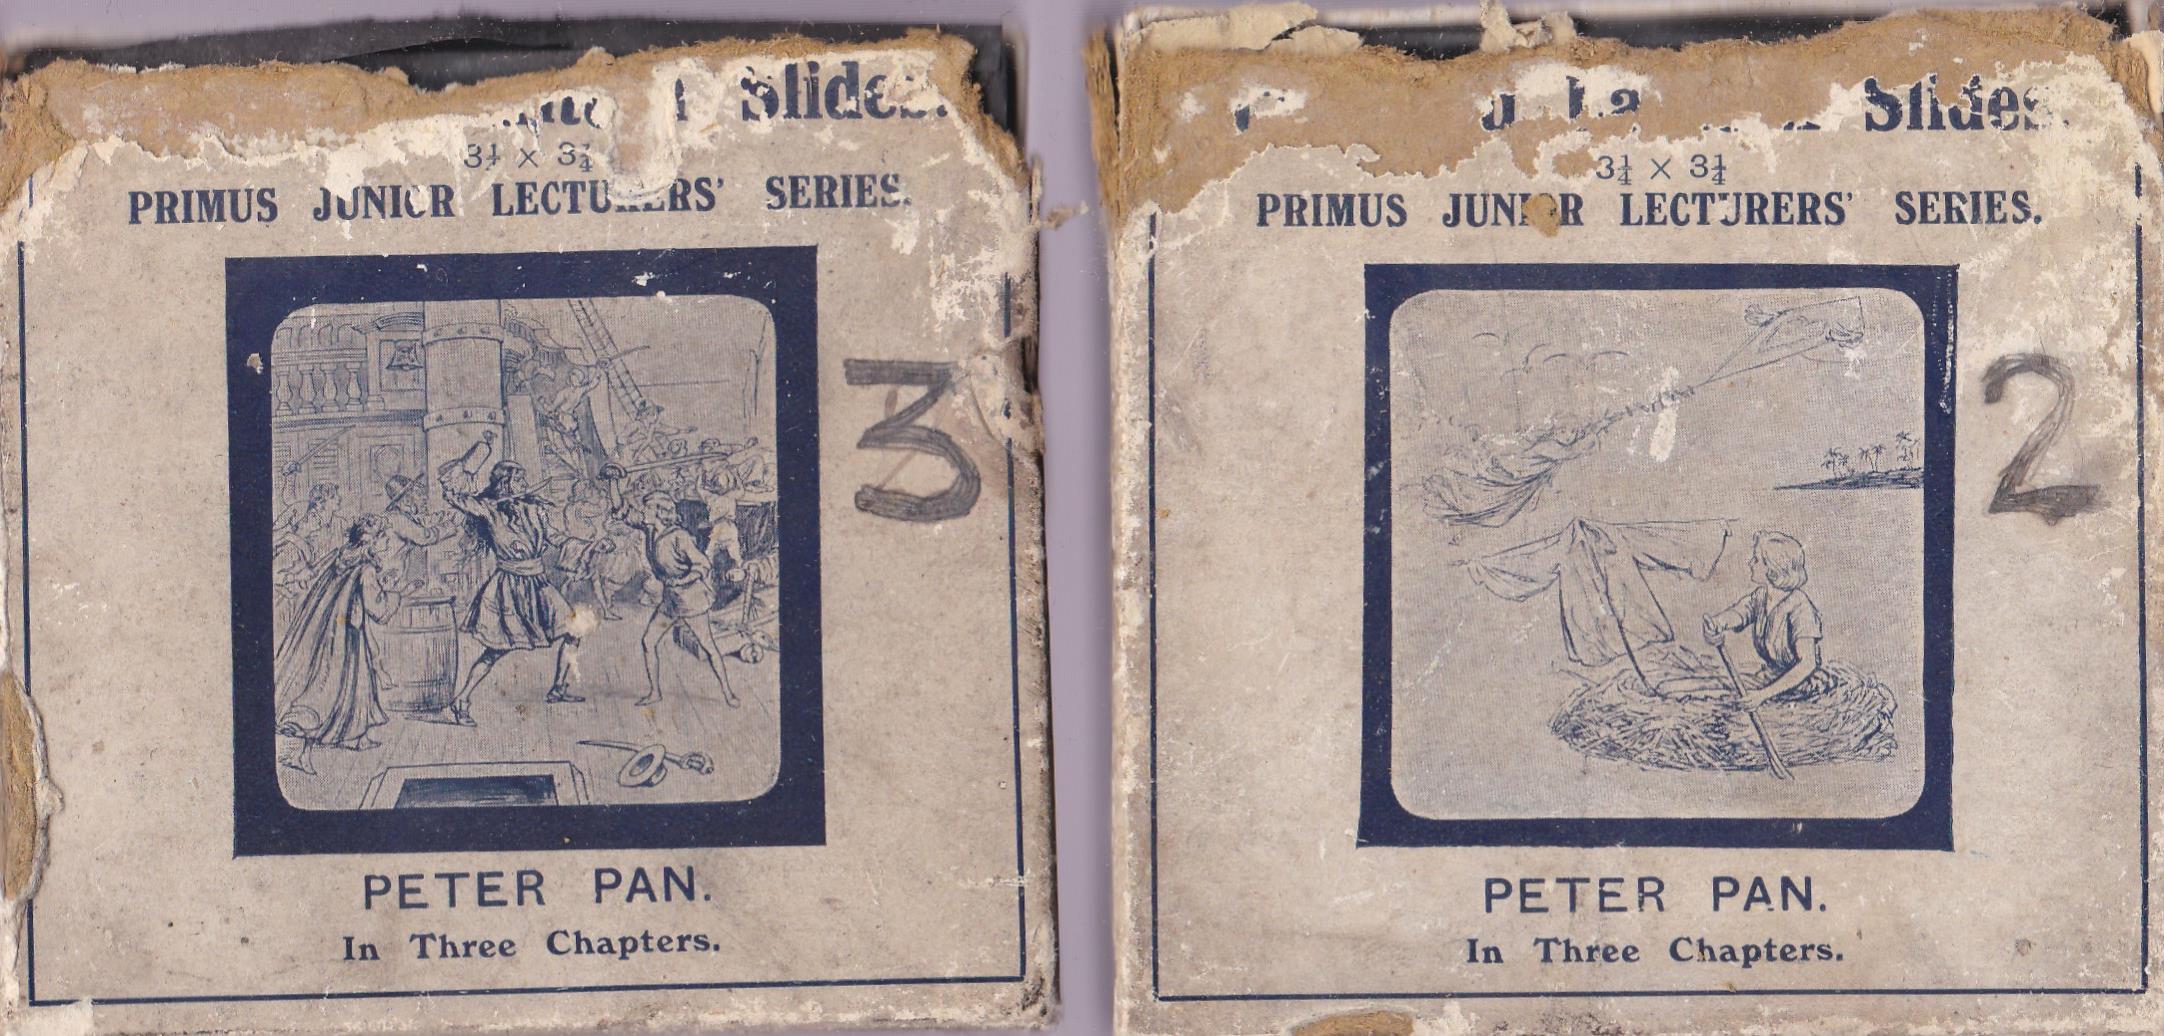 Peter Pan Magic Lantern Coloured slides, Primus Junior Lecturers series Peter Pan Magic Lantern - Image 4 of 4